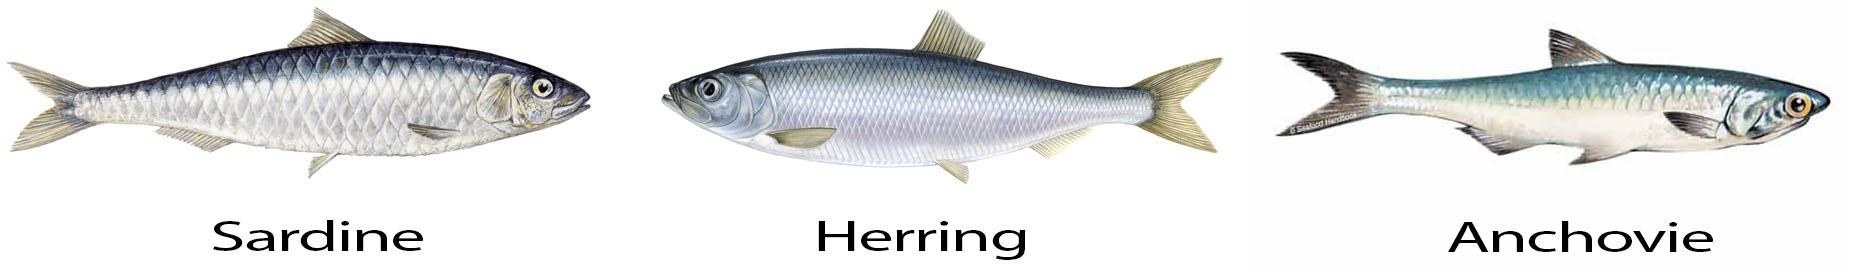 3 types of fish: Sardines, Anchovies, Herrings